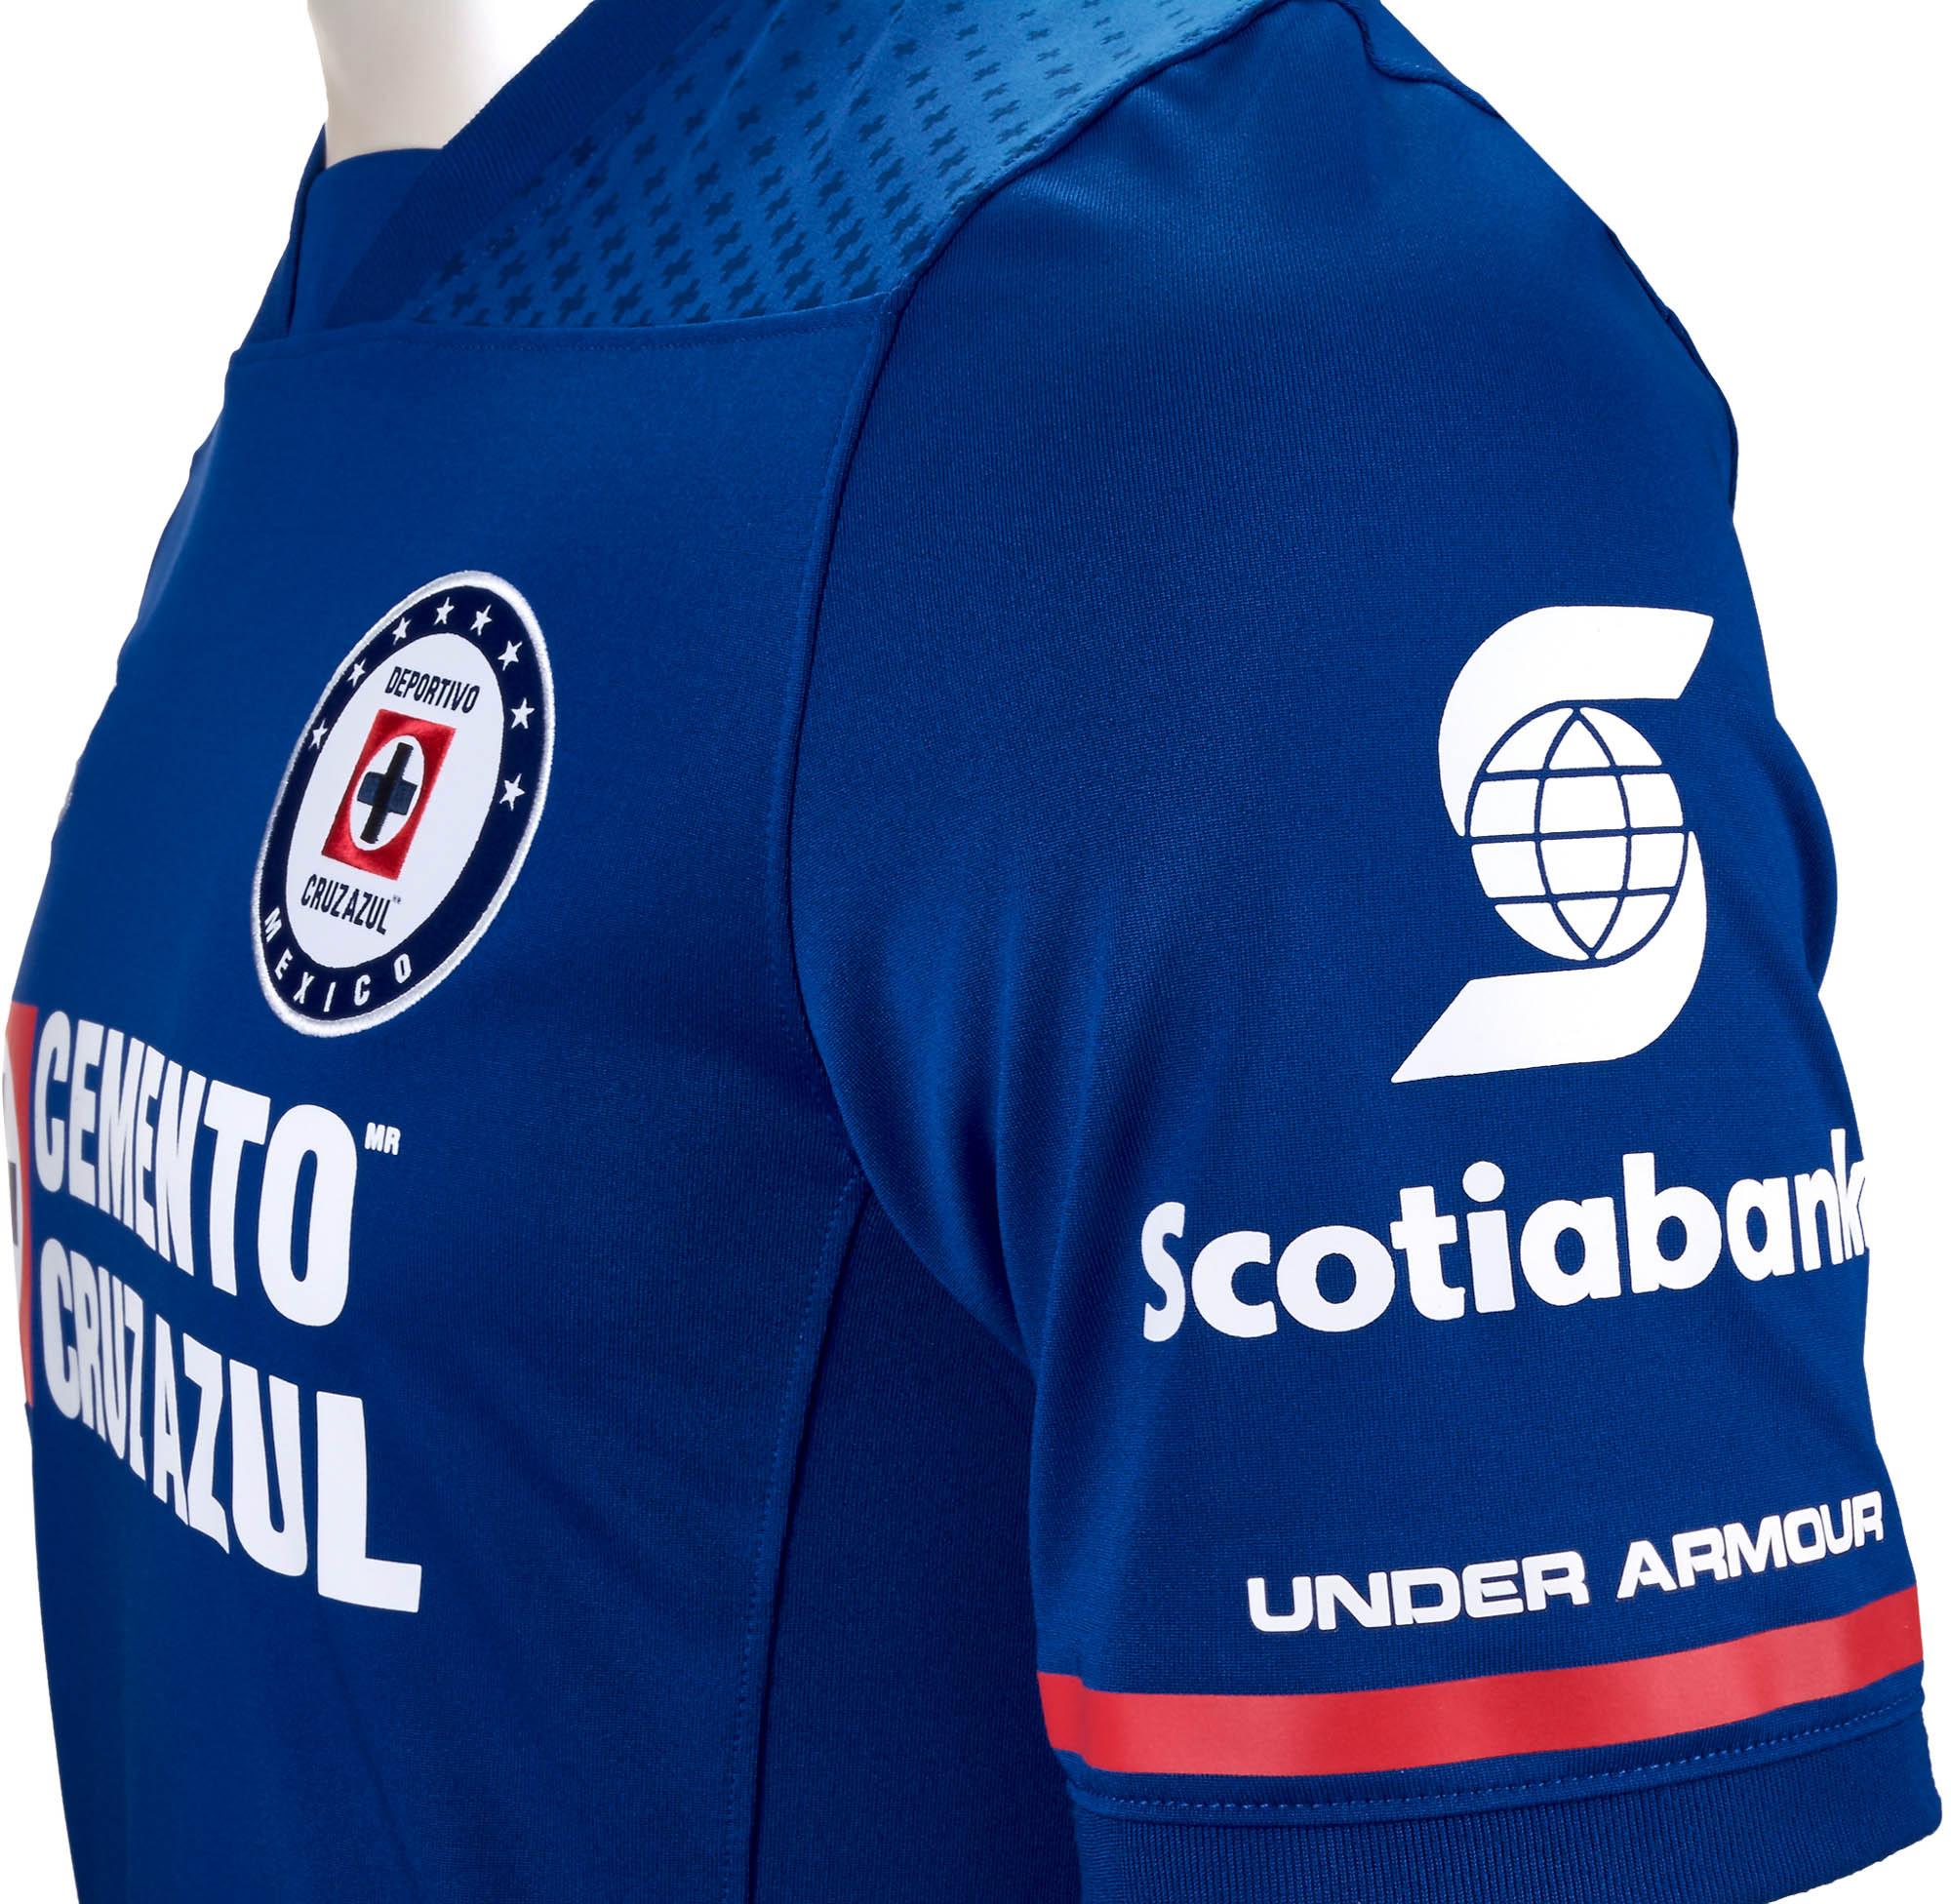 0550d04f268 Home / Licensed Soccer Jerseys and Gear / Club Teams / Cruz Azul